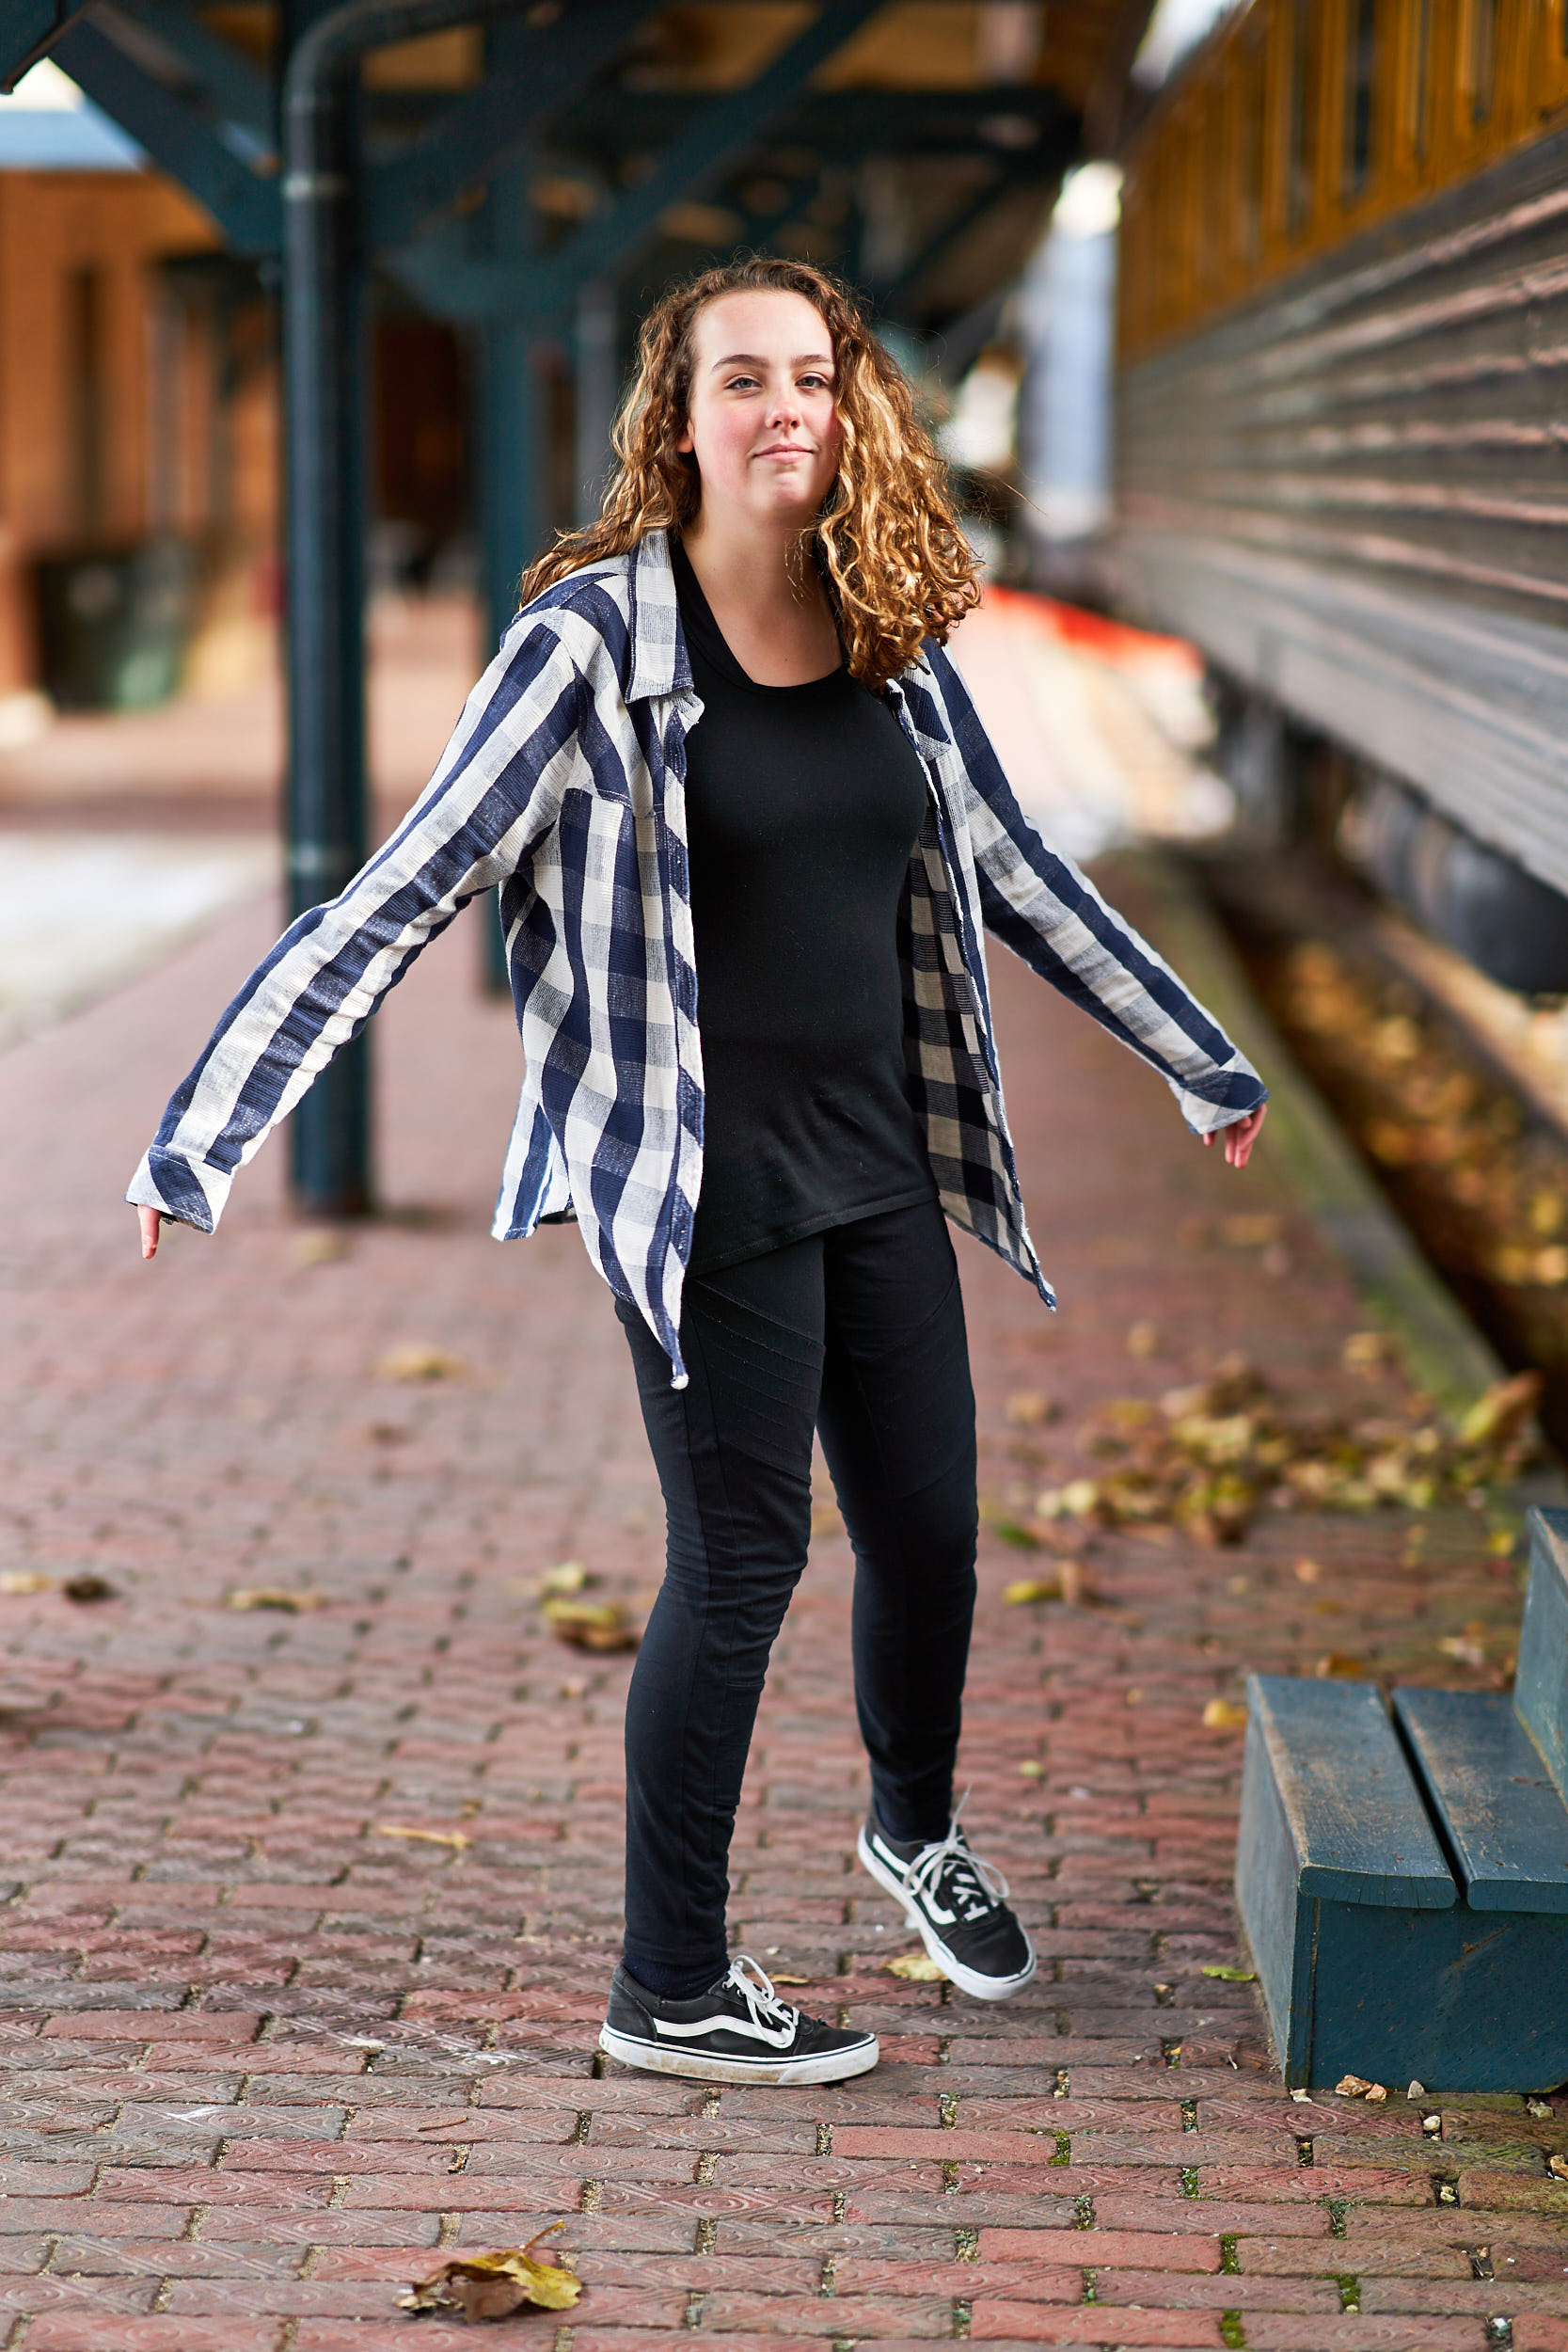 Teenage Girl Downtown Train Portrait | Photo By BillyBengtson.com